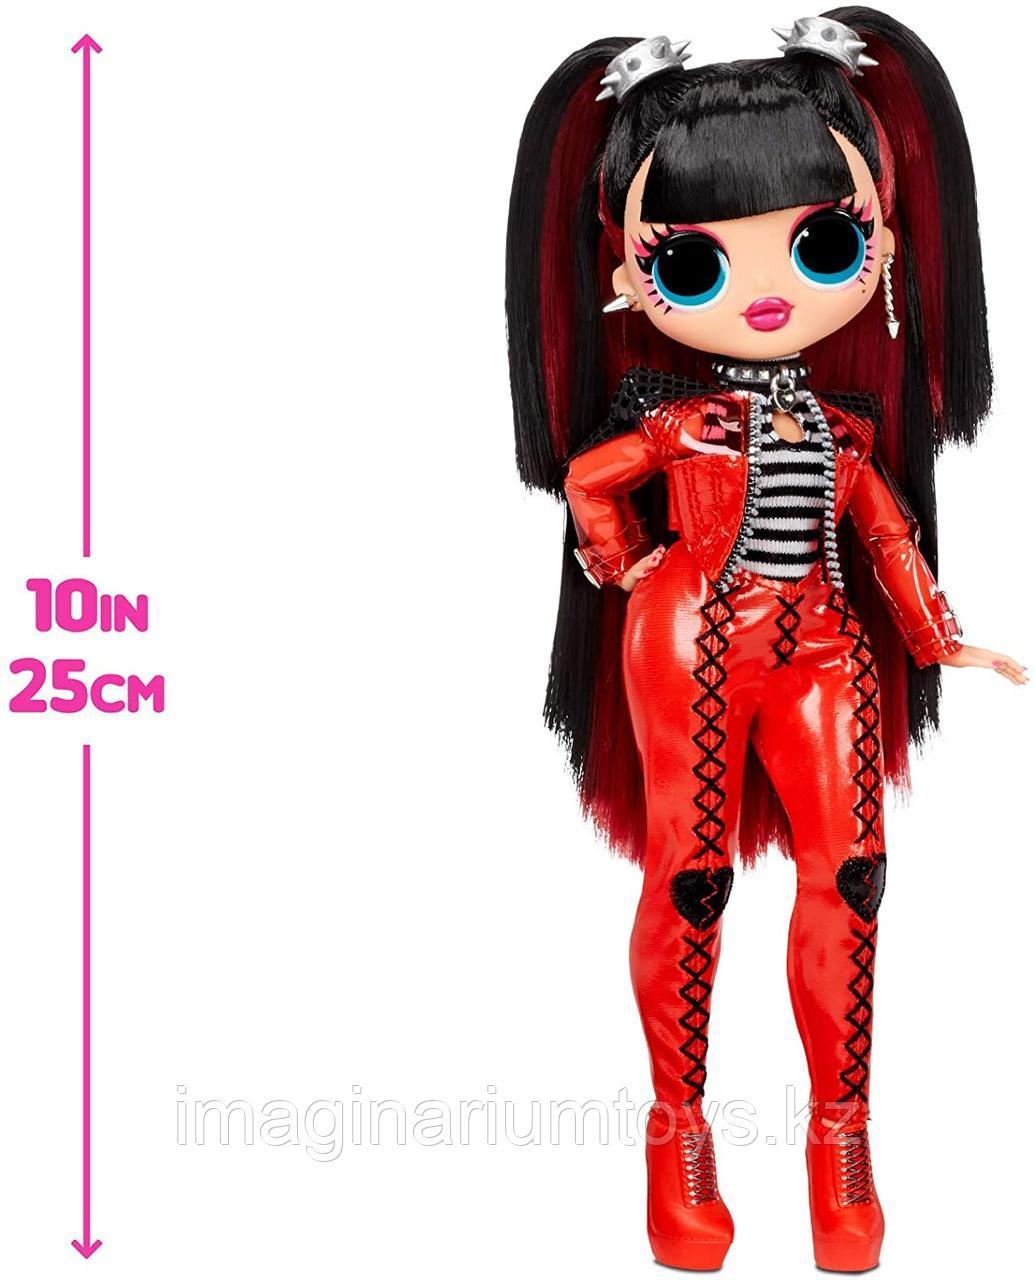 Большая Кукла ЛОЛ ОМГ 4 серия LOL OMG Spicy Babe - фото 6